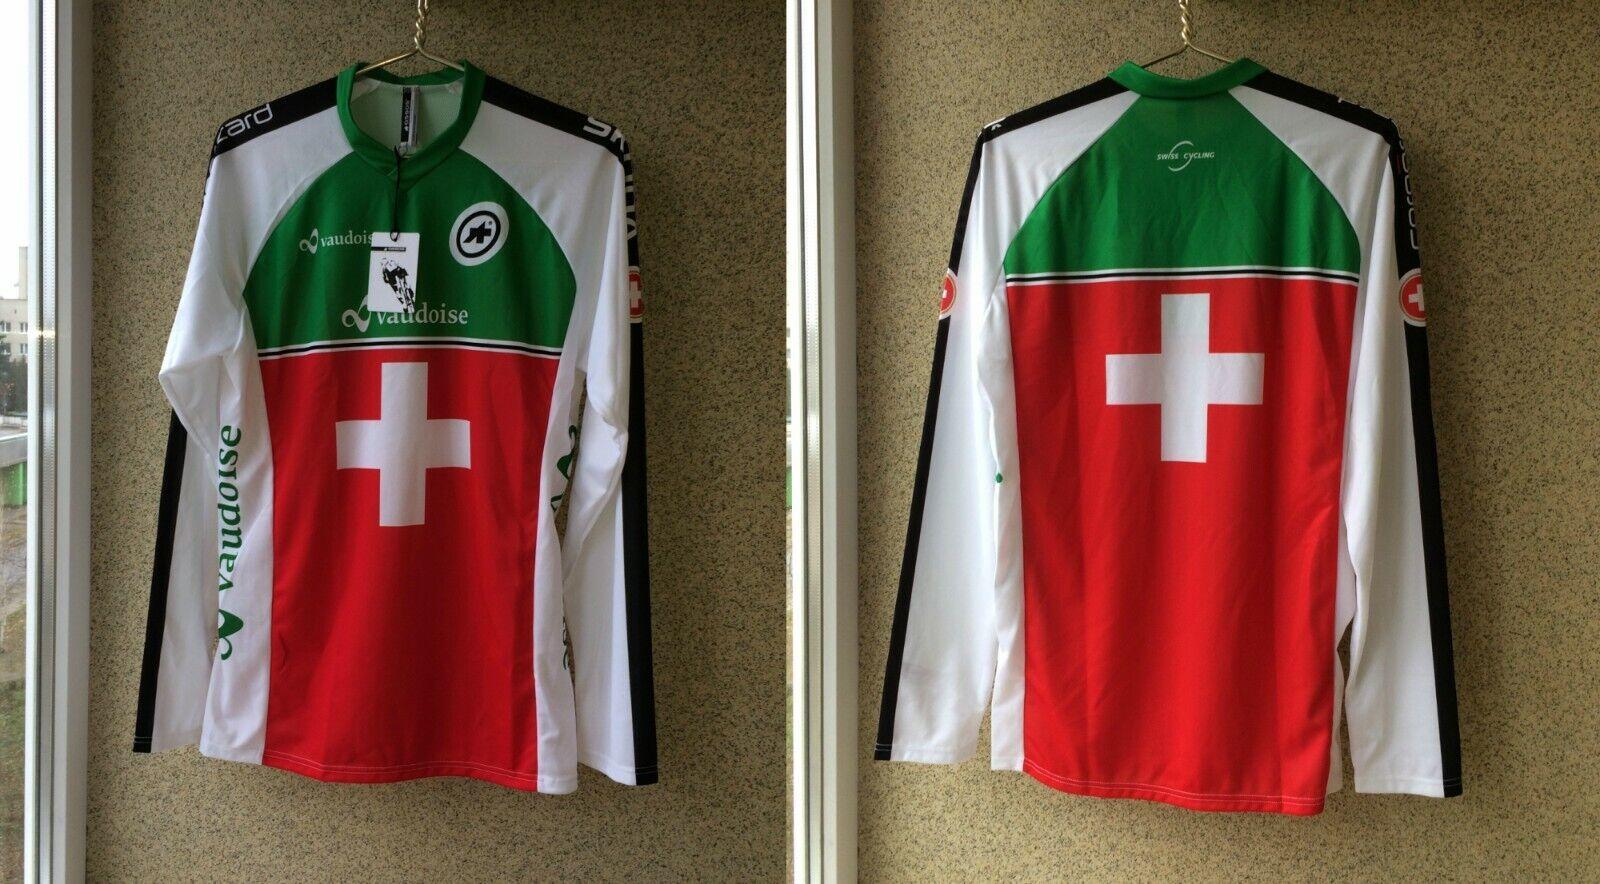 Federation Jersey Suisse Cycling Assos Jersey XS Camiseta Zwitserland Shirt